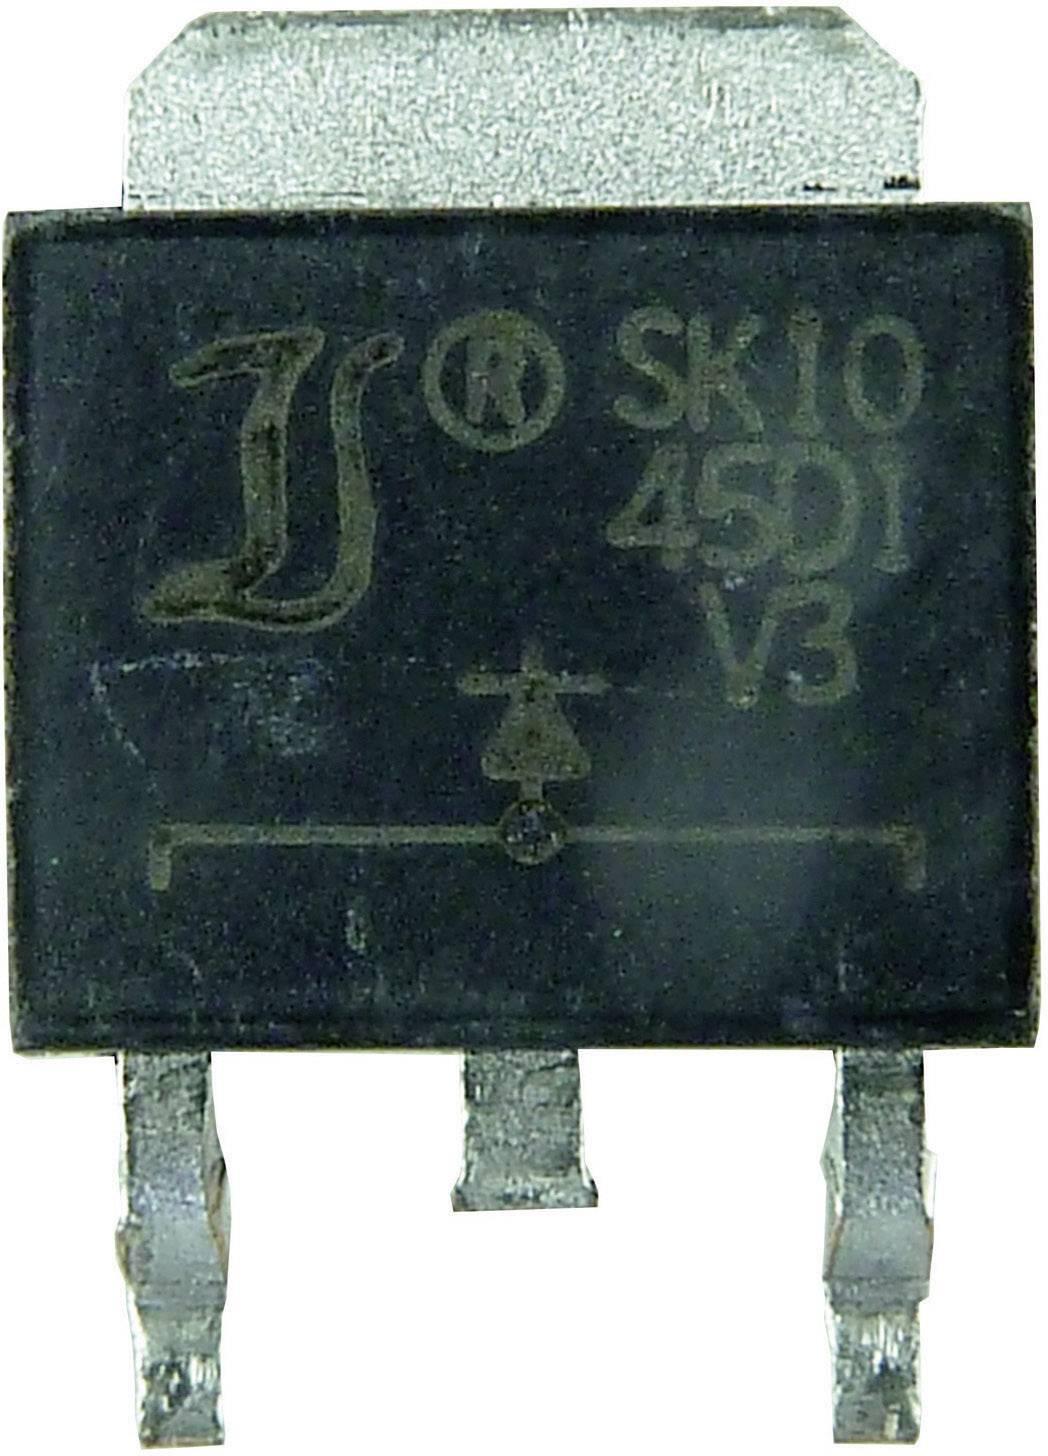 diode bridge tru components tc s16 msd 2 to 263ab 1000 v [ 1000 x 1000 Pixel ]